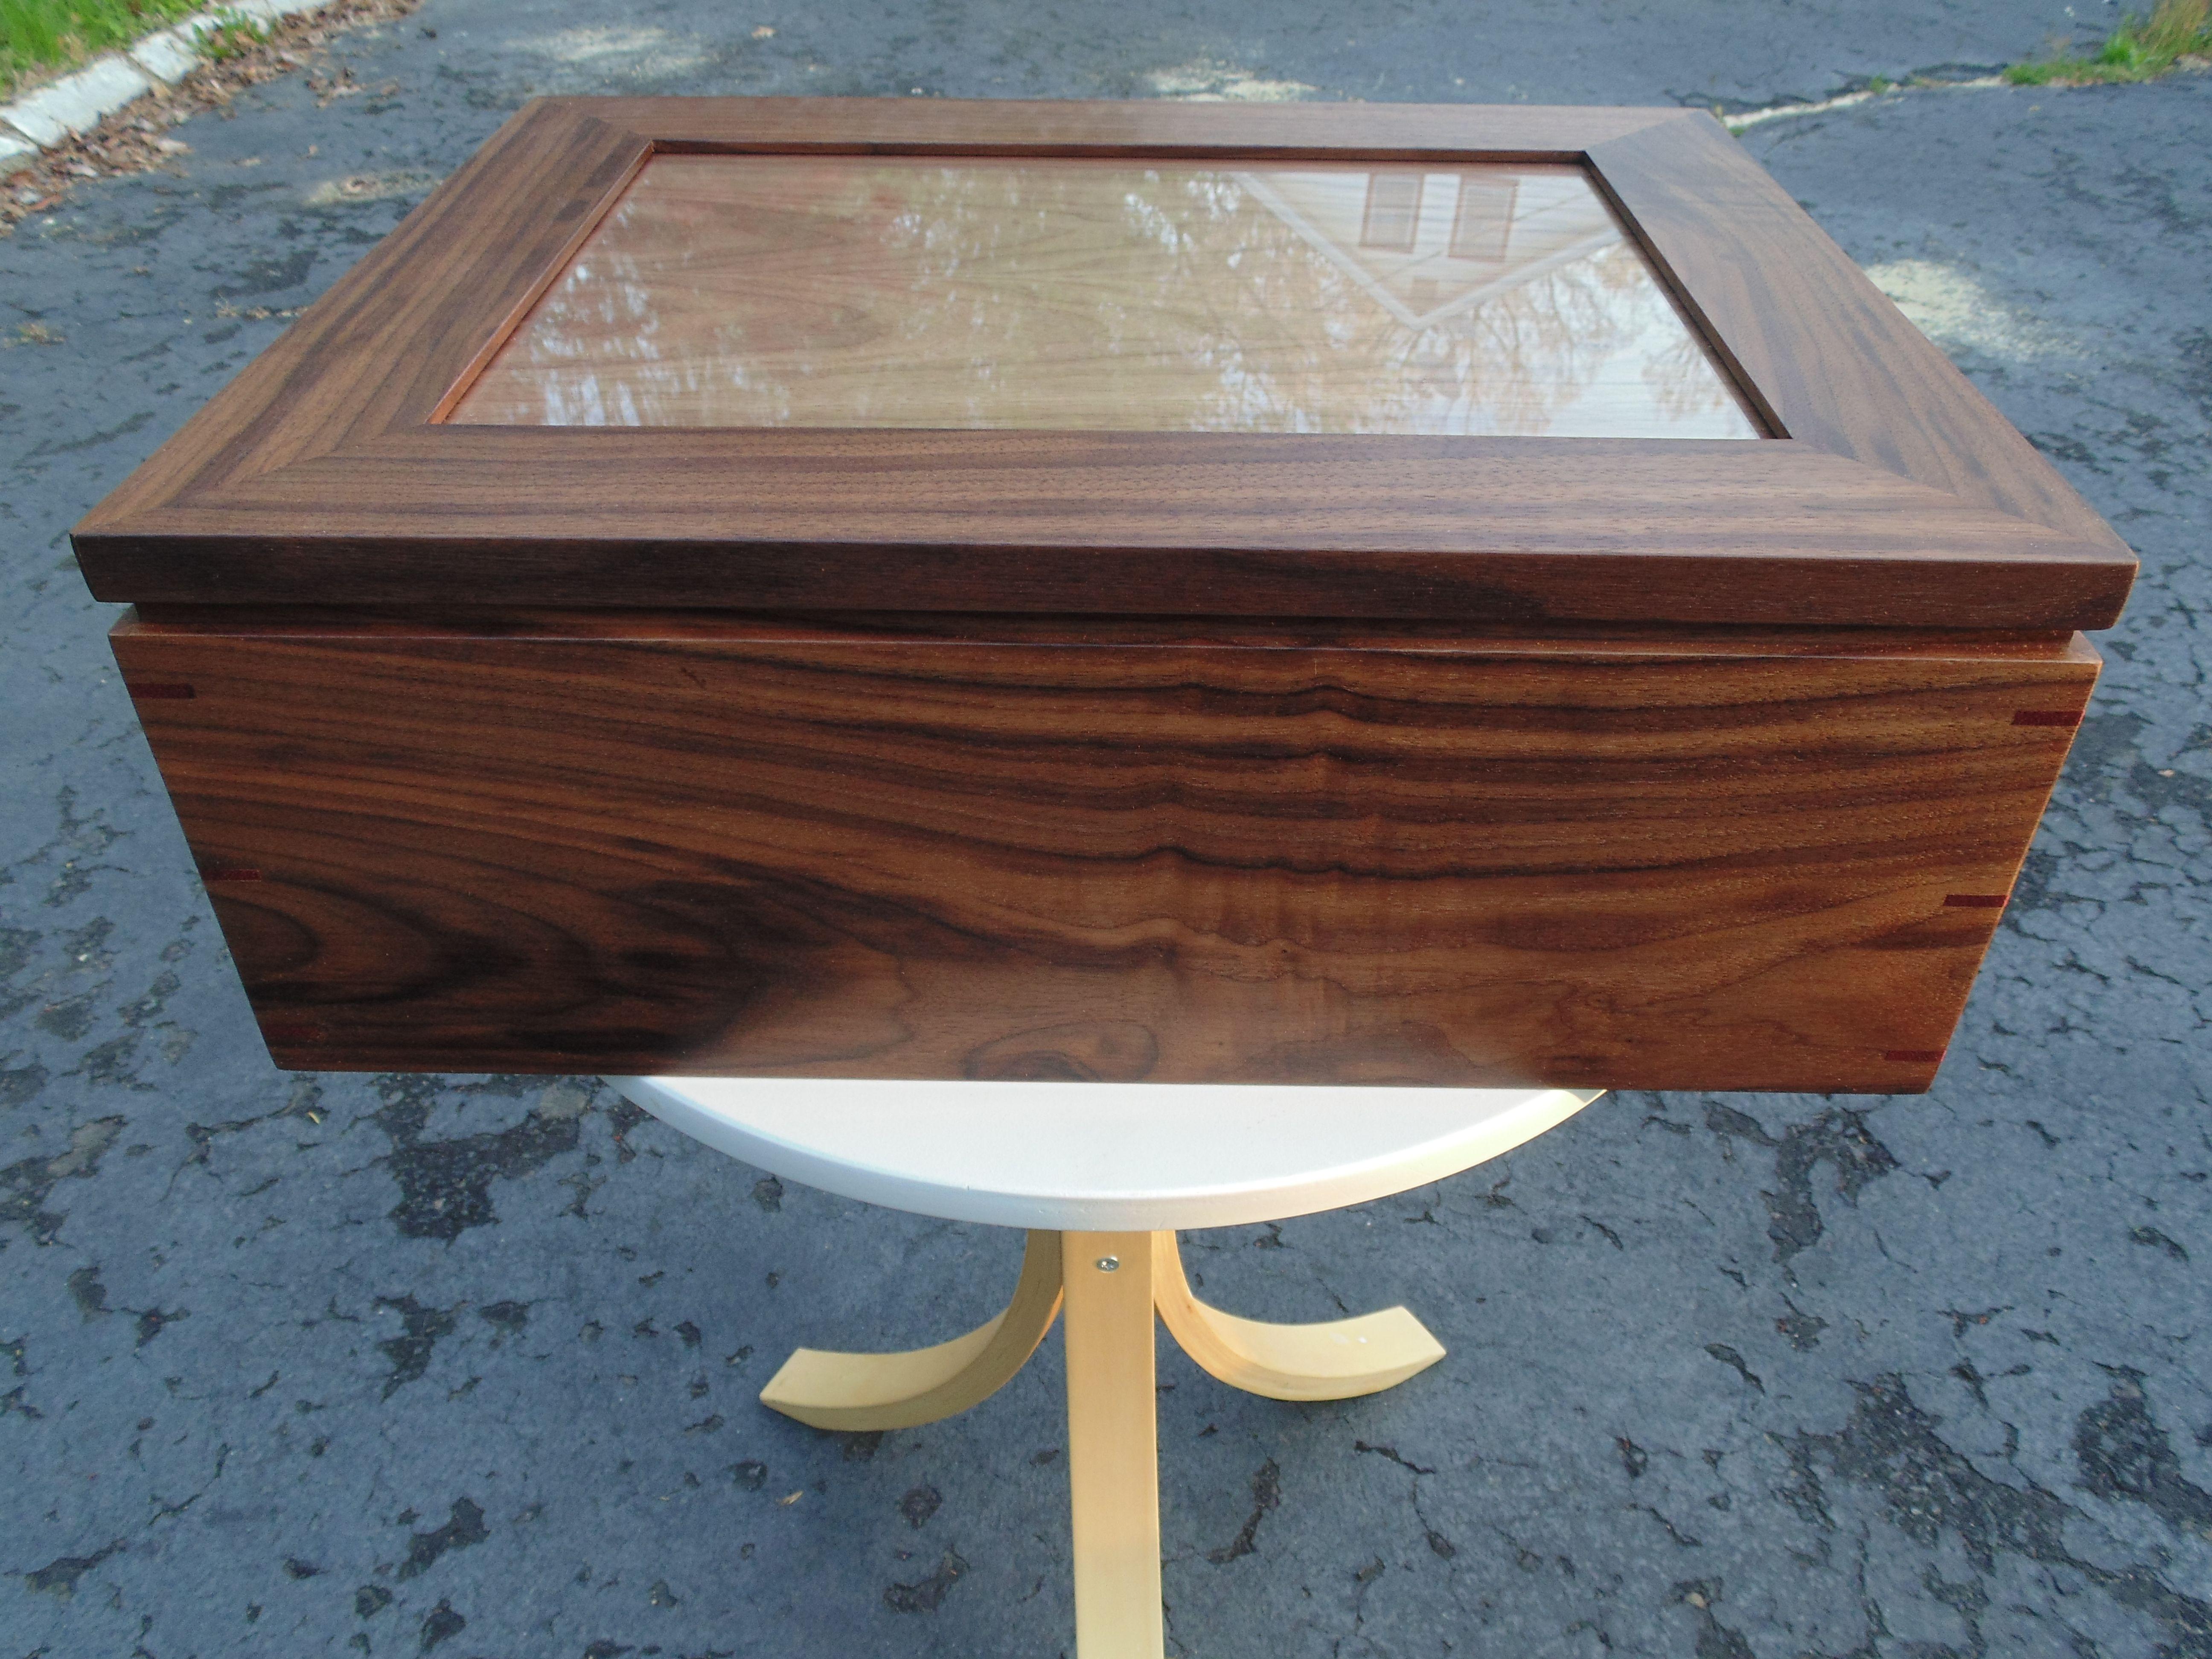 Handmade Solid Walnut Keepsake Box W/ Picture Frame Lid by Insight ...